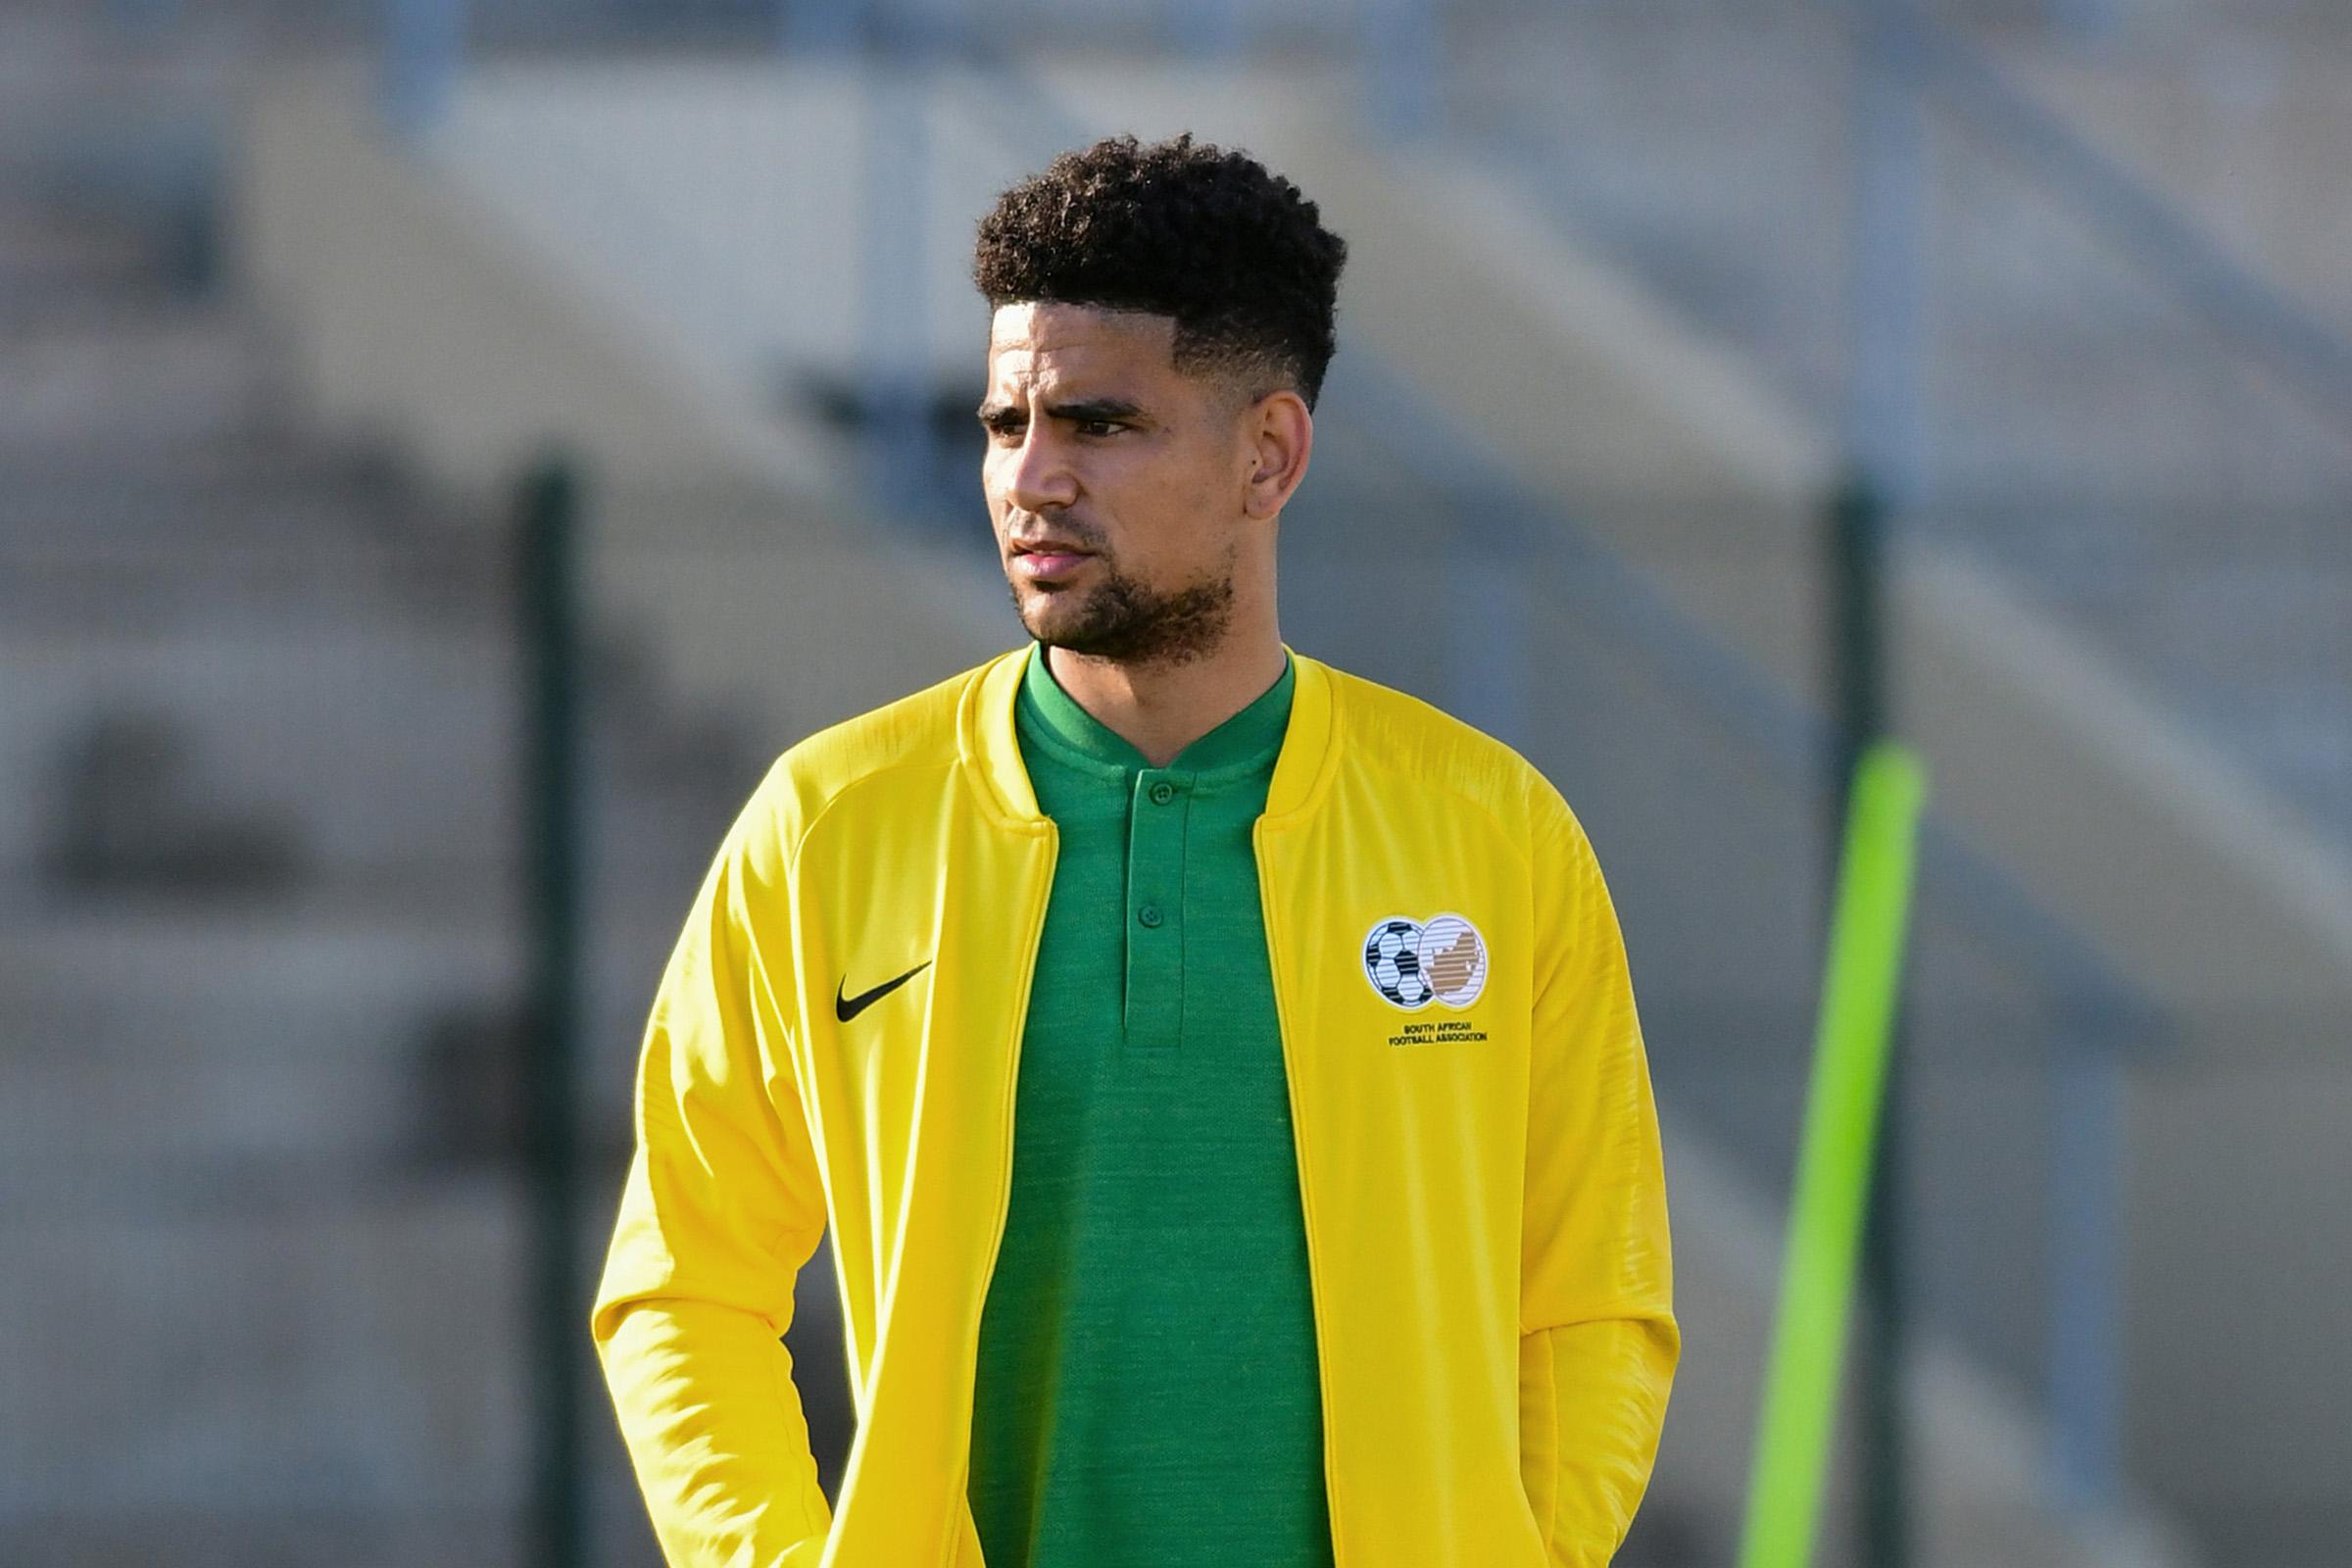 30 May 2019: Keagan Dolly during a Bafana Bafana media open day and coaching clinic at the Sugar Ray Xulu Stadium in Durban, KwaZulu-Natal. (Photograph by Darren Stewart/Gallo Images)